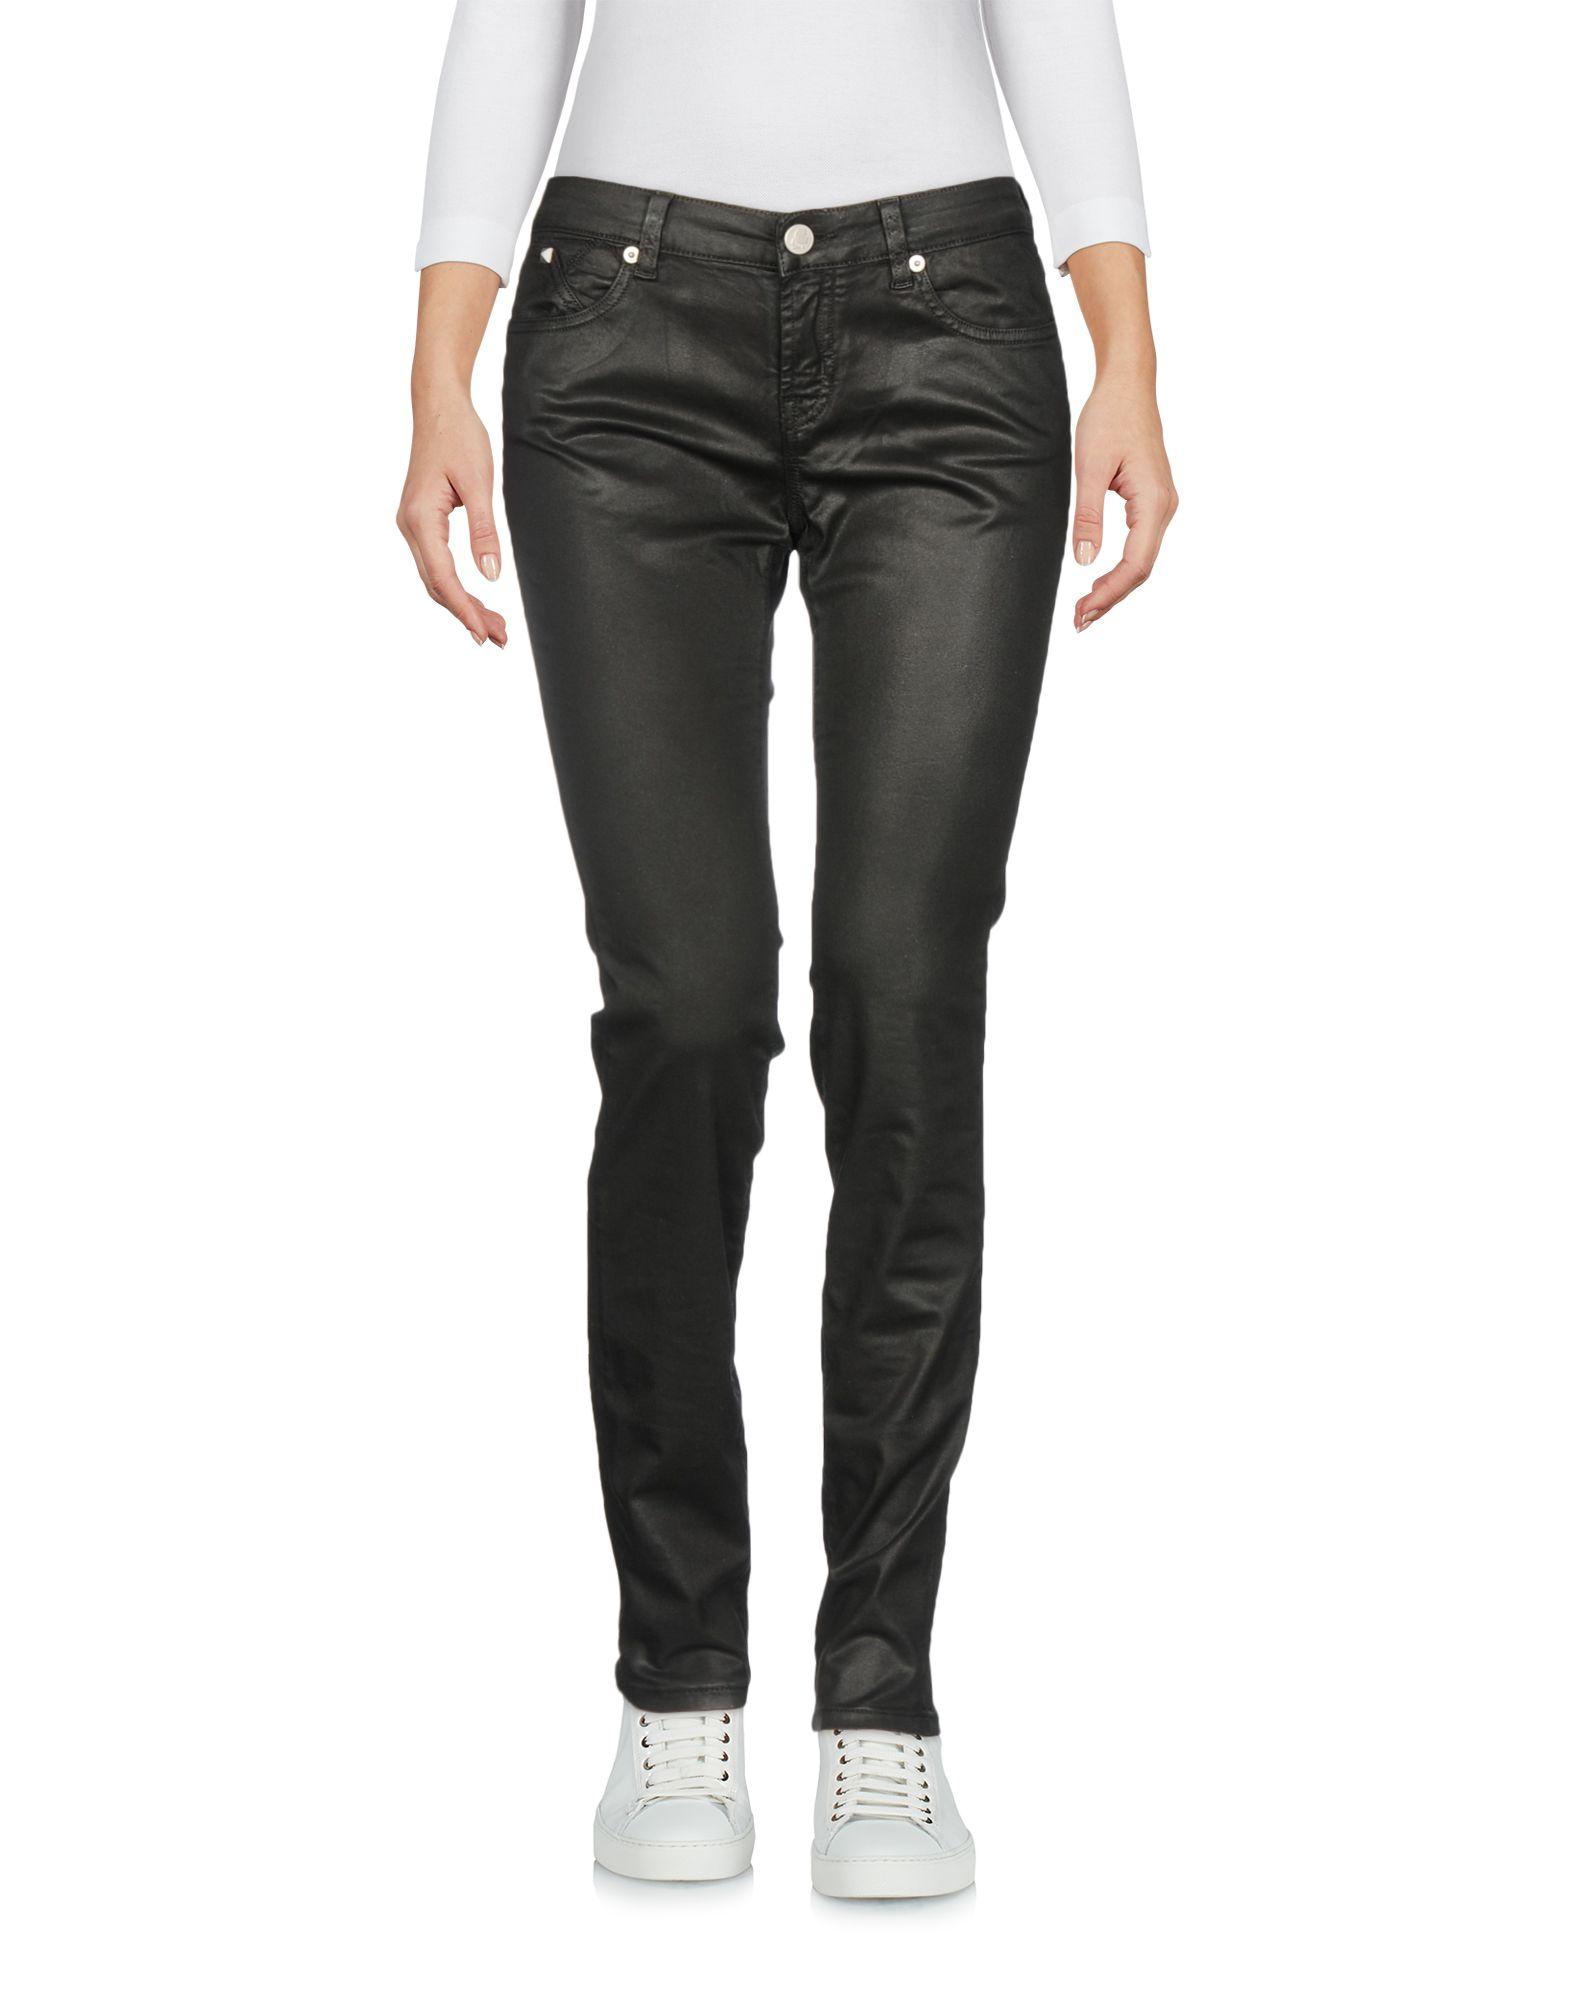 Pantalone Karl Lagerfeld Donna - Acquista online su 0EPo5Uf